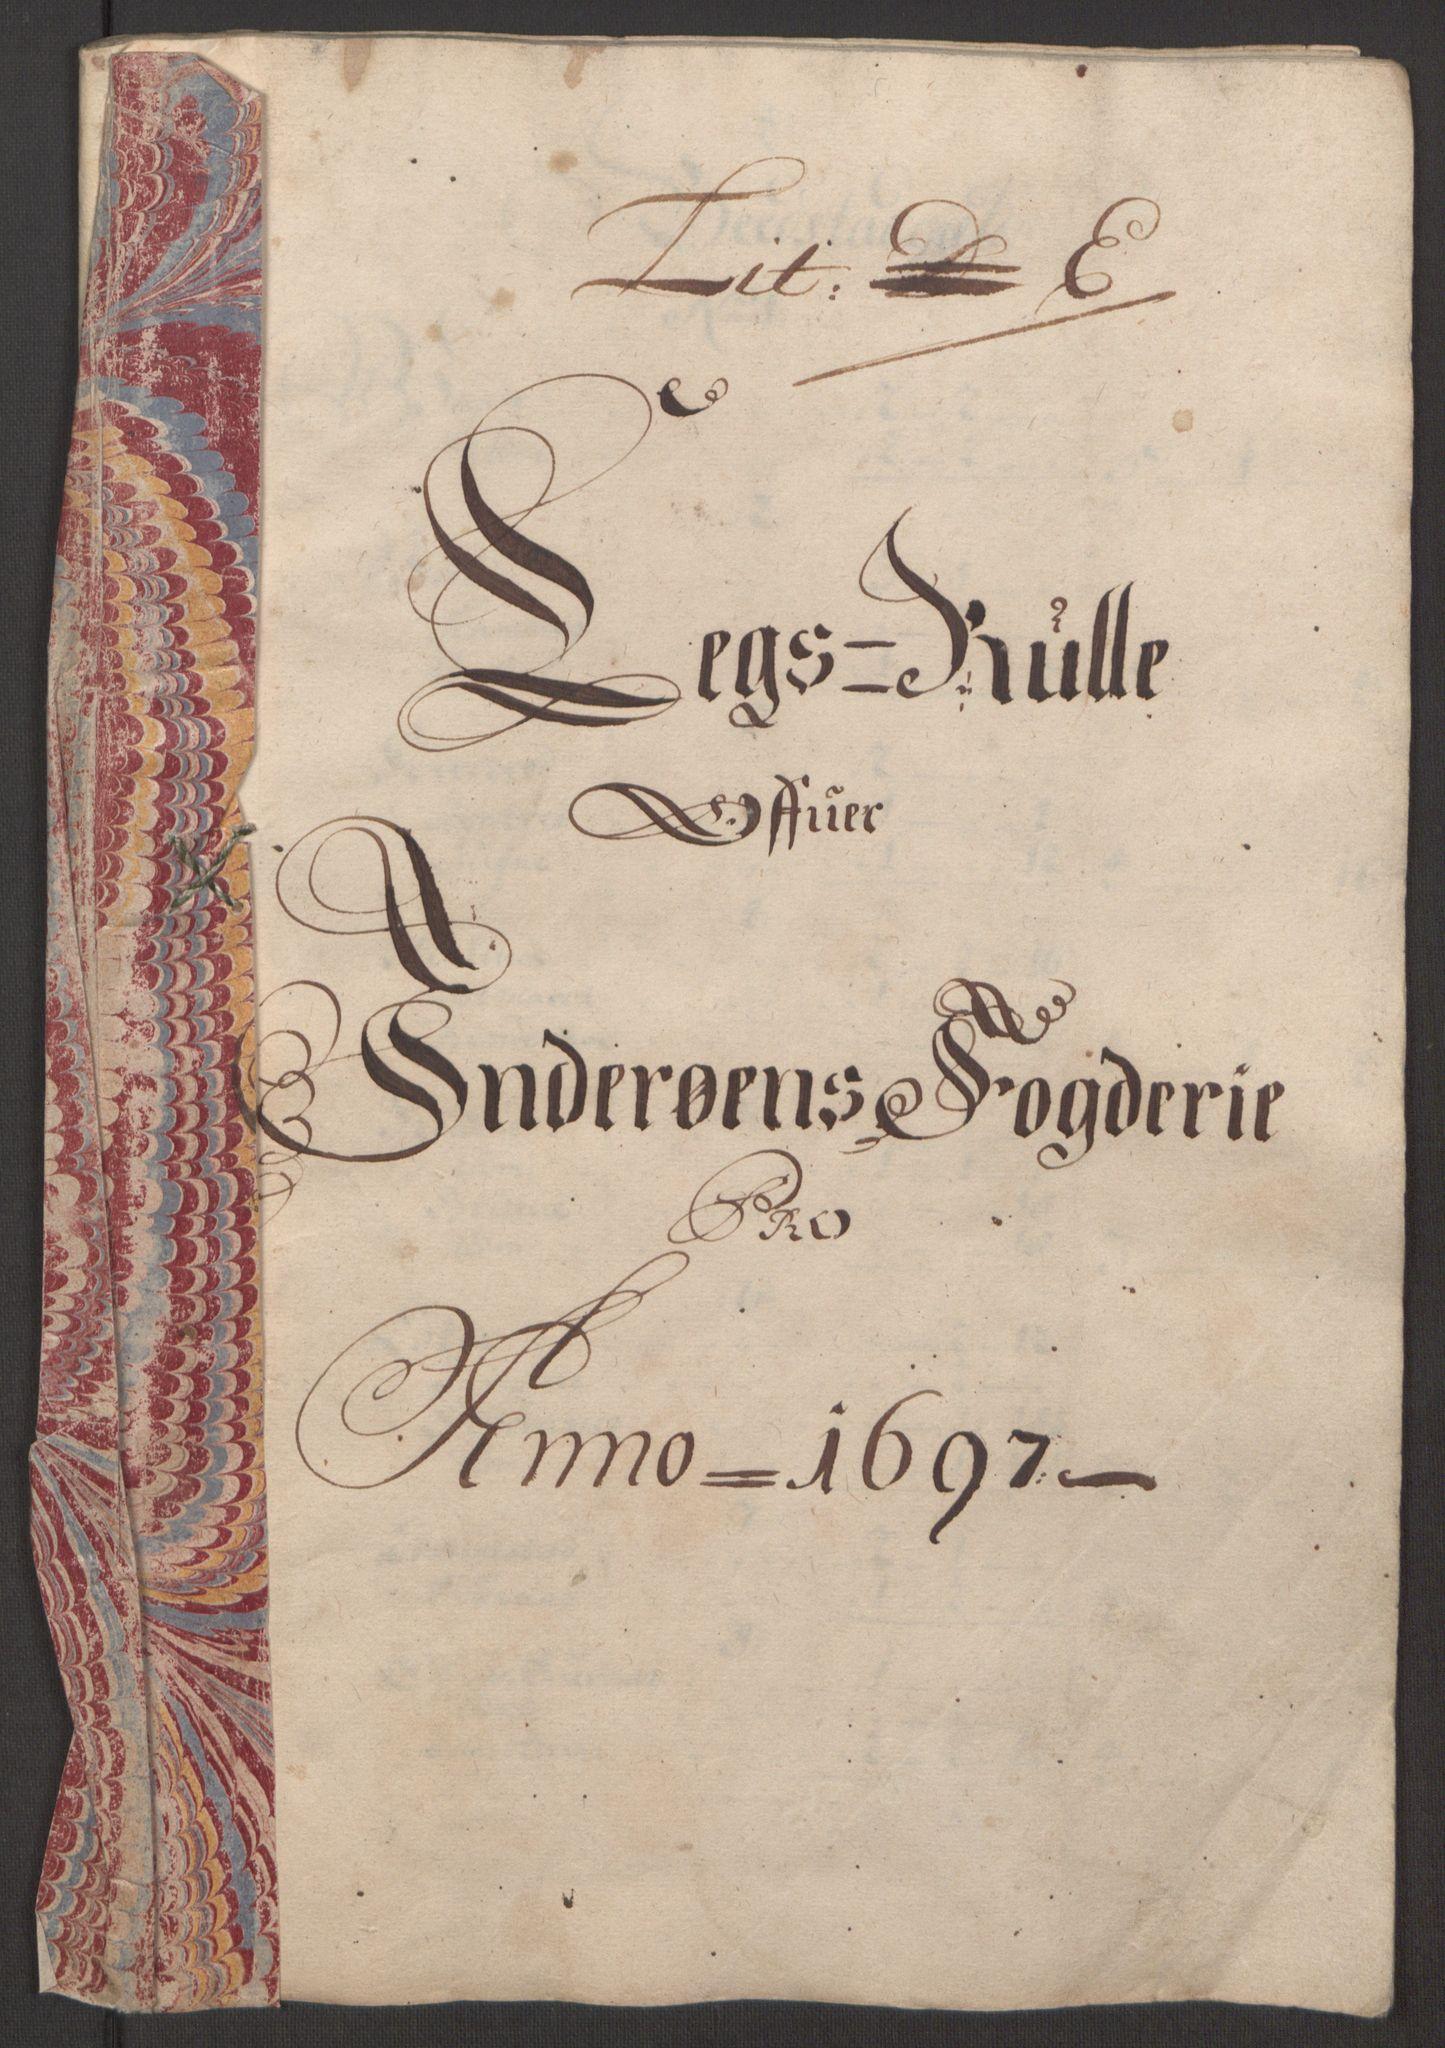 RA, Rentekammeret inntil 1814, Reviderte regnskaper, Fogderegnskap, R63/L4309: Fogderegnskap Inderøy, 1695-1697, s. 415